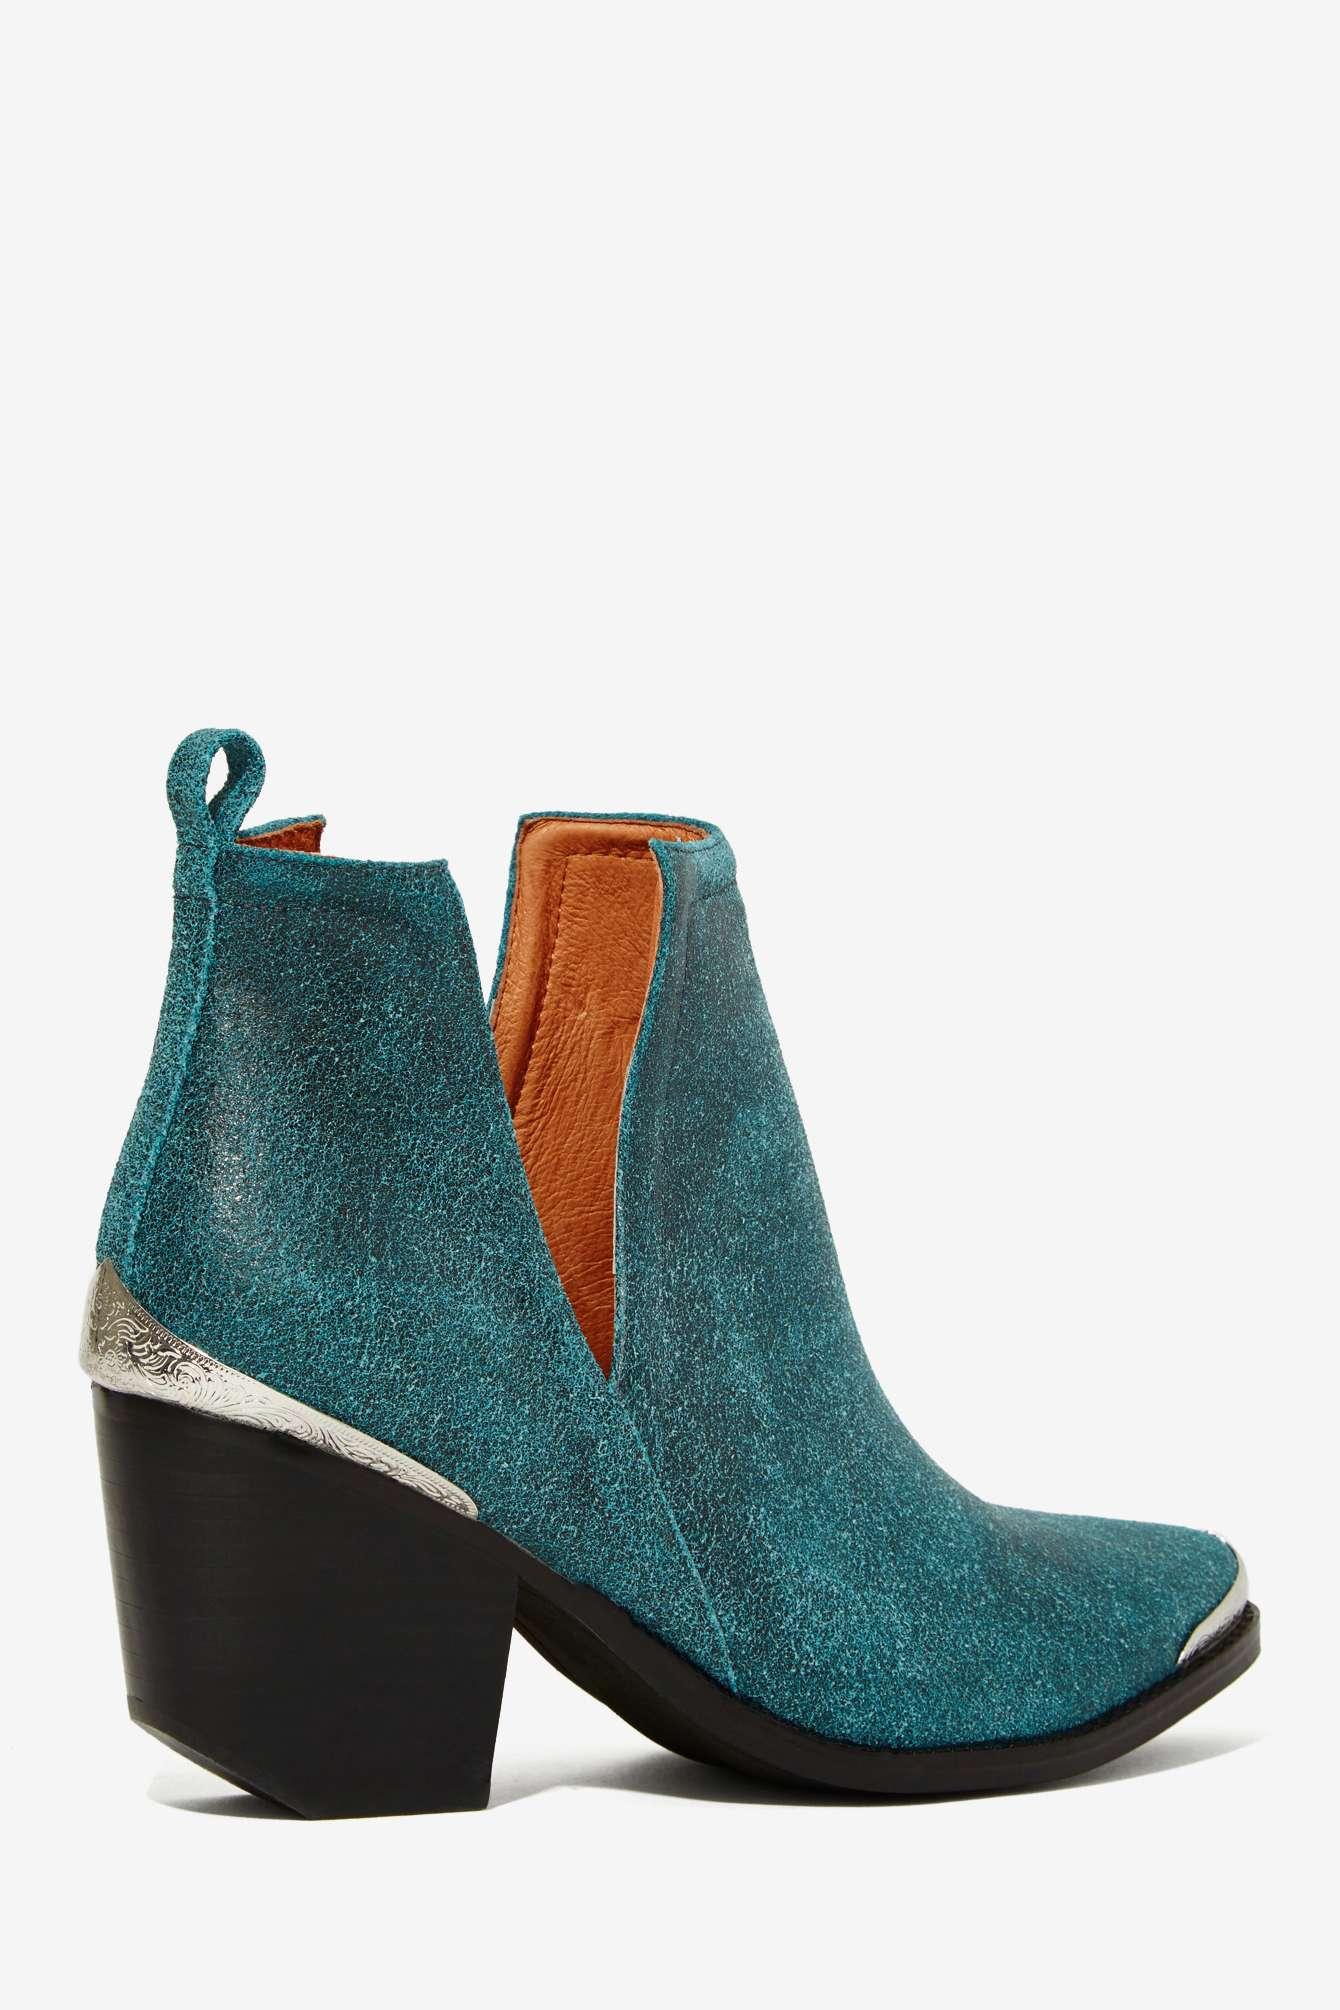 Teal Suede Shoe